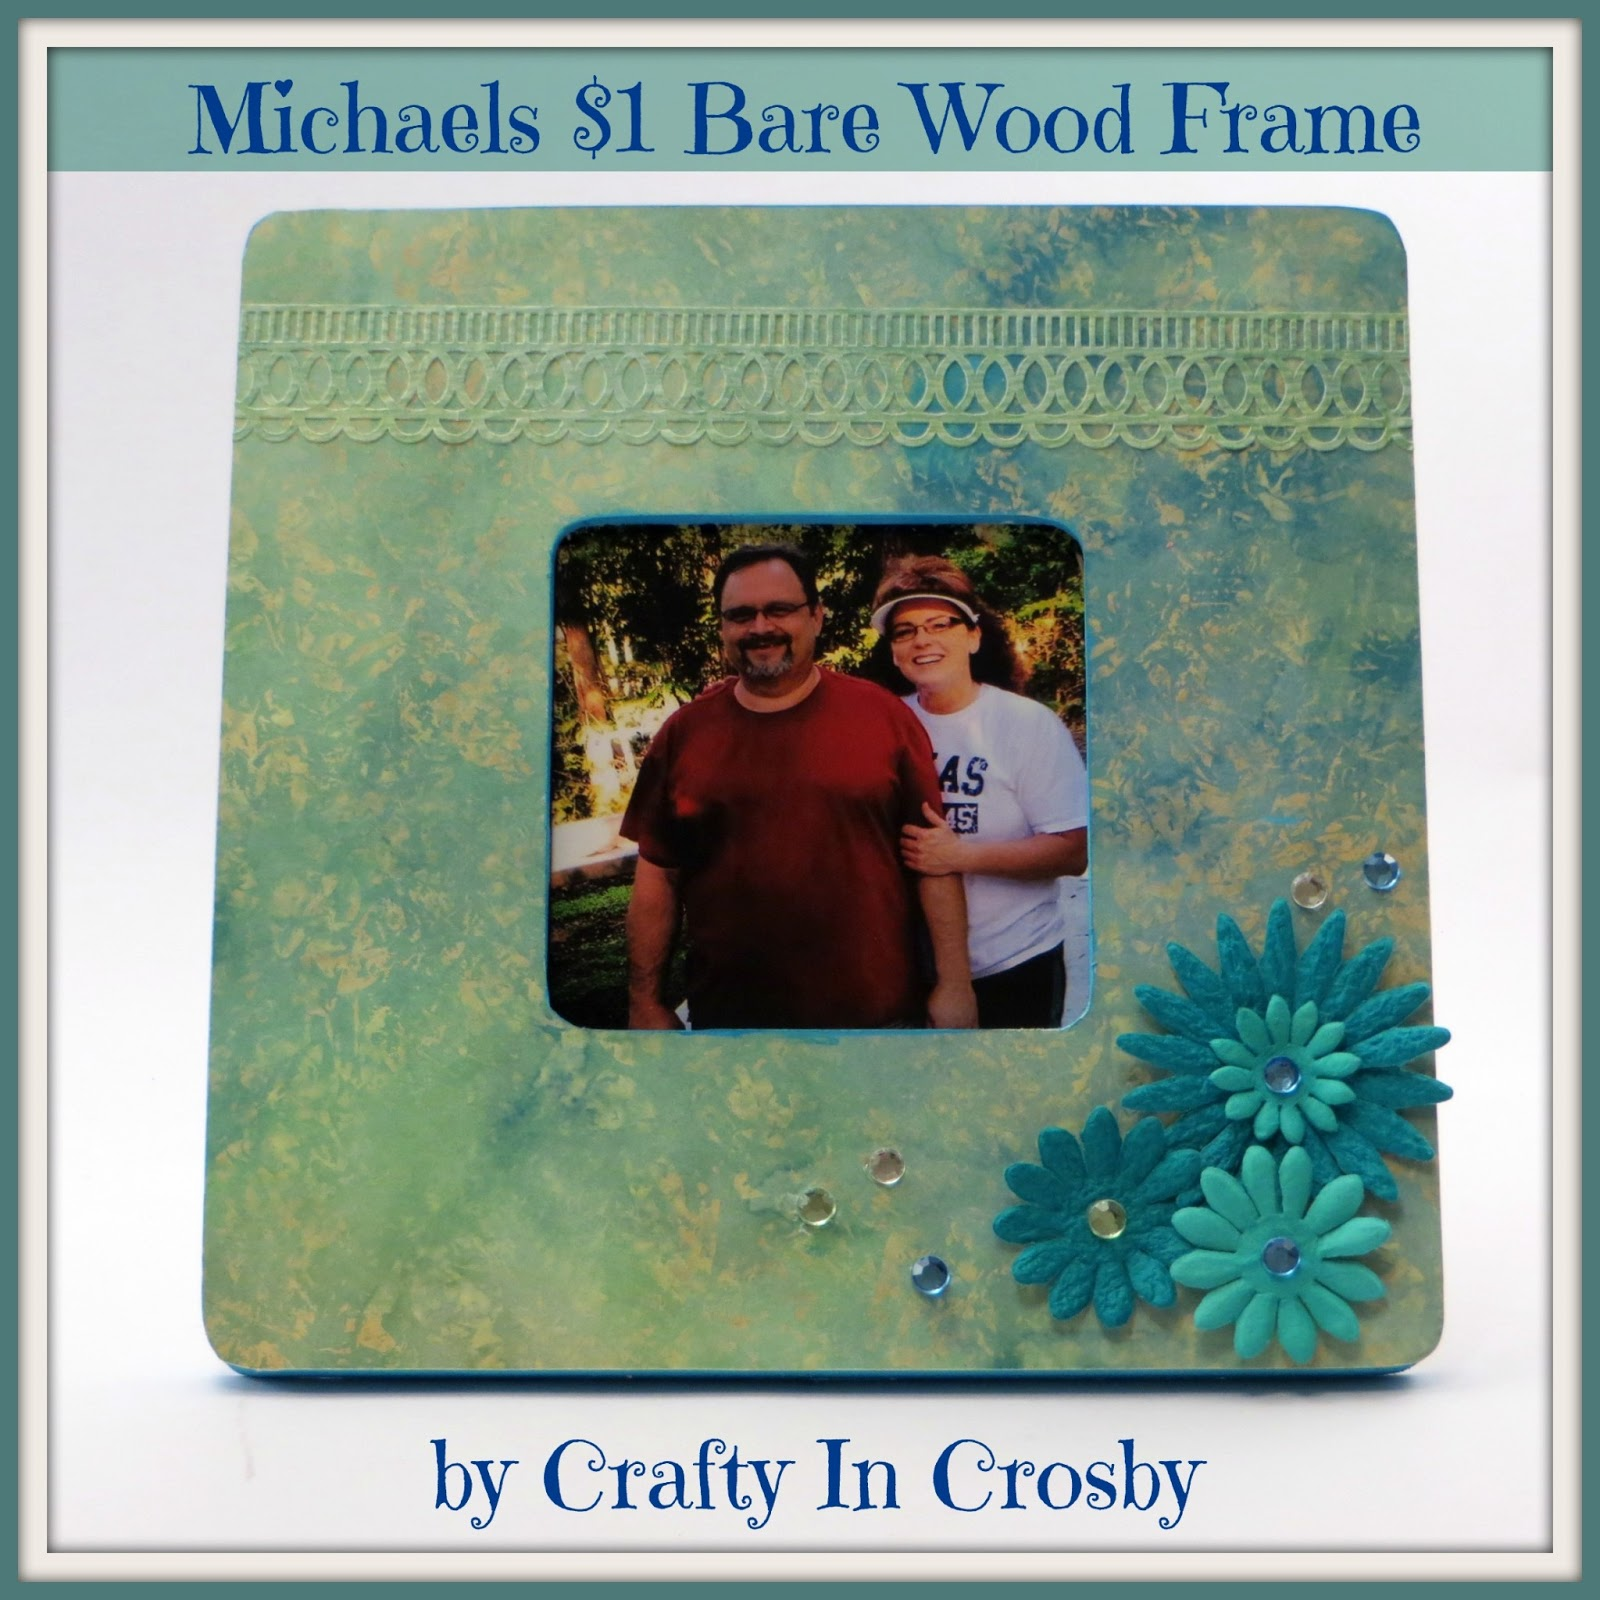 Michaels Craft Store Picture Frames | Credainatcon.com